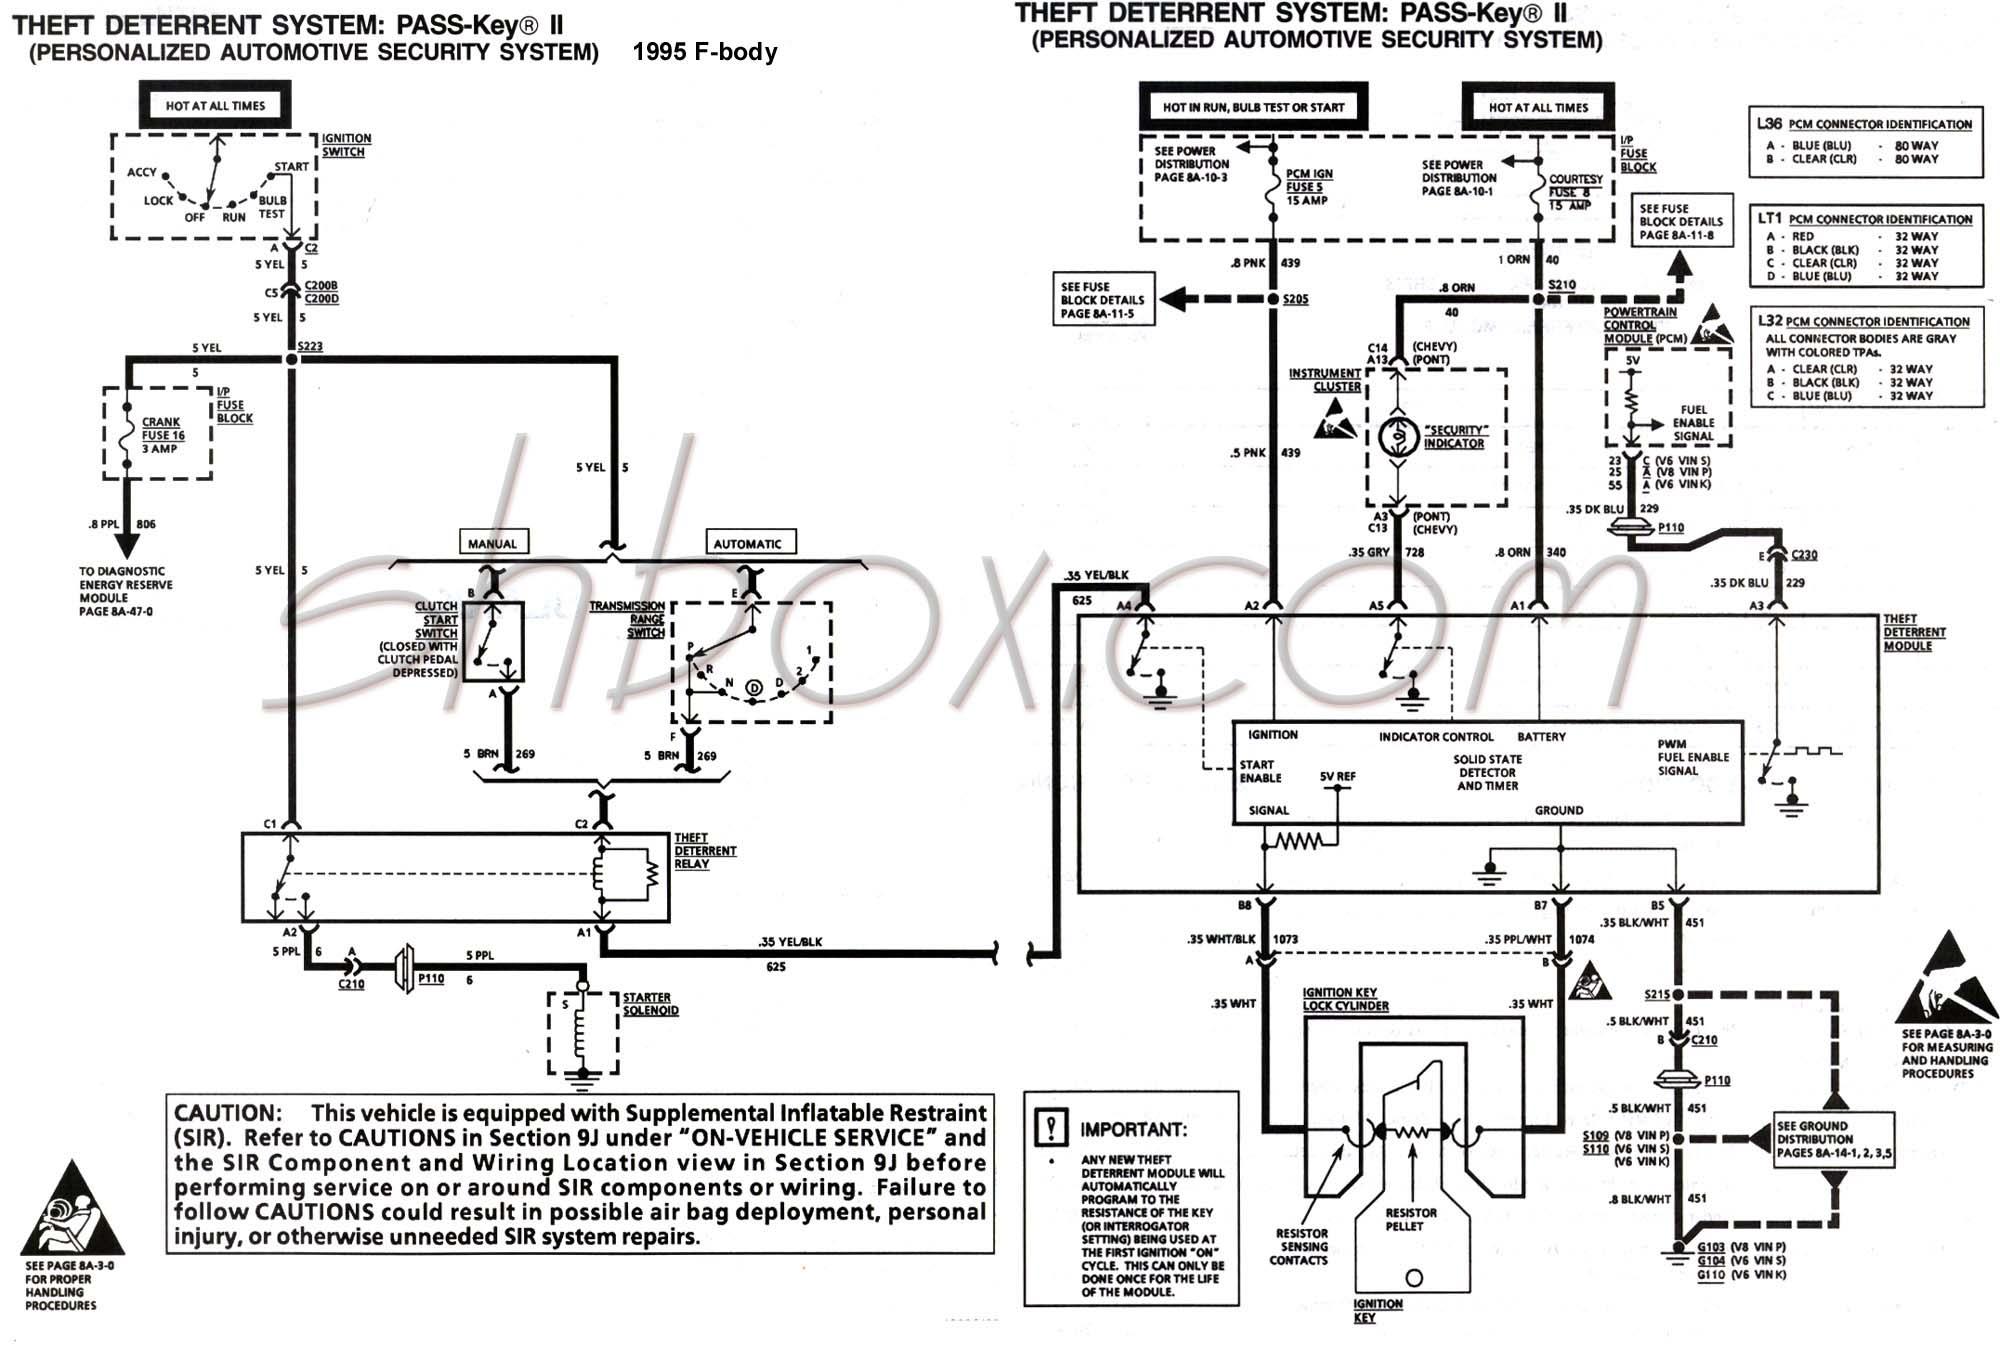 1991 camaro vats wiring diagram schematic